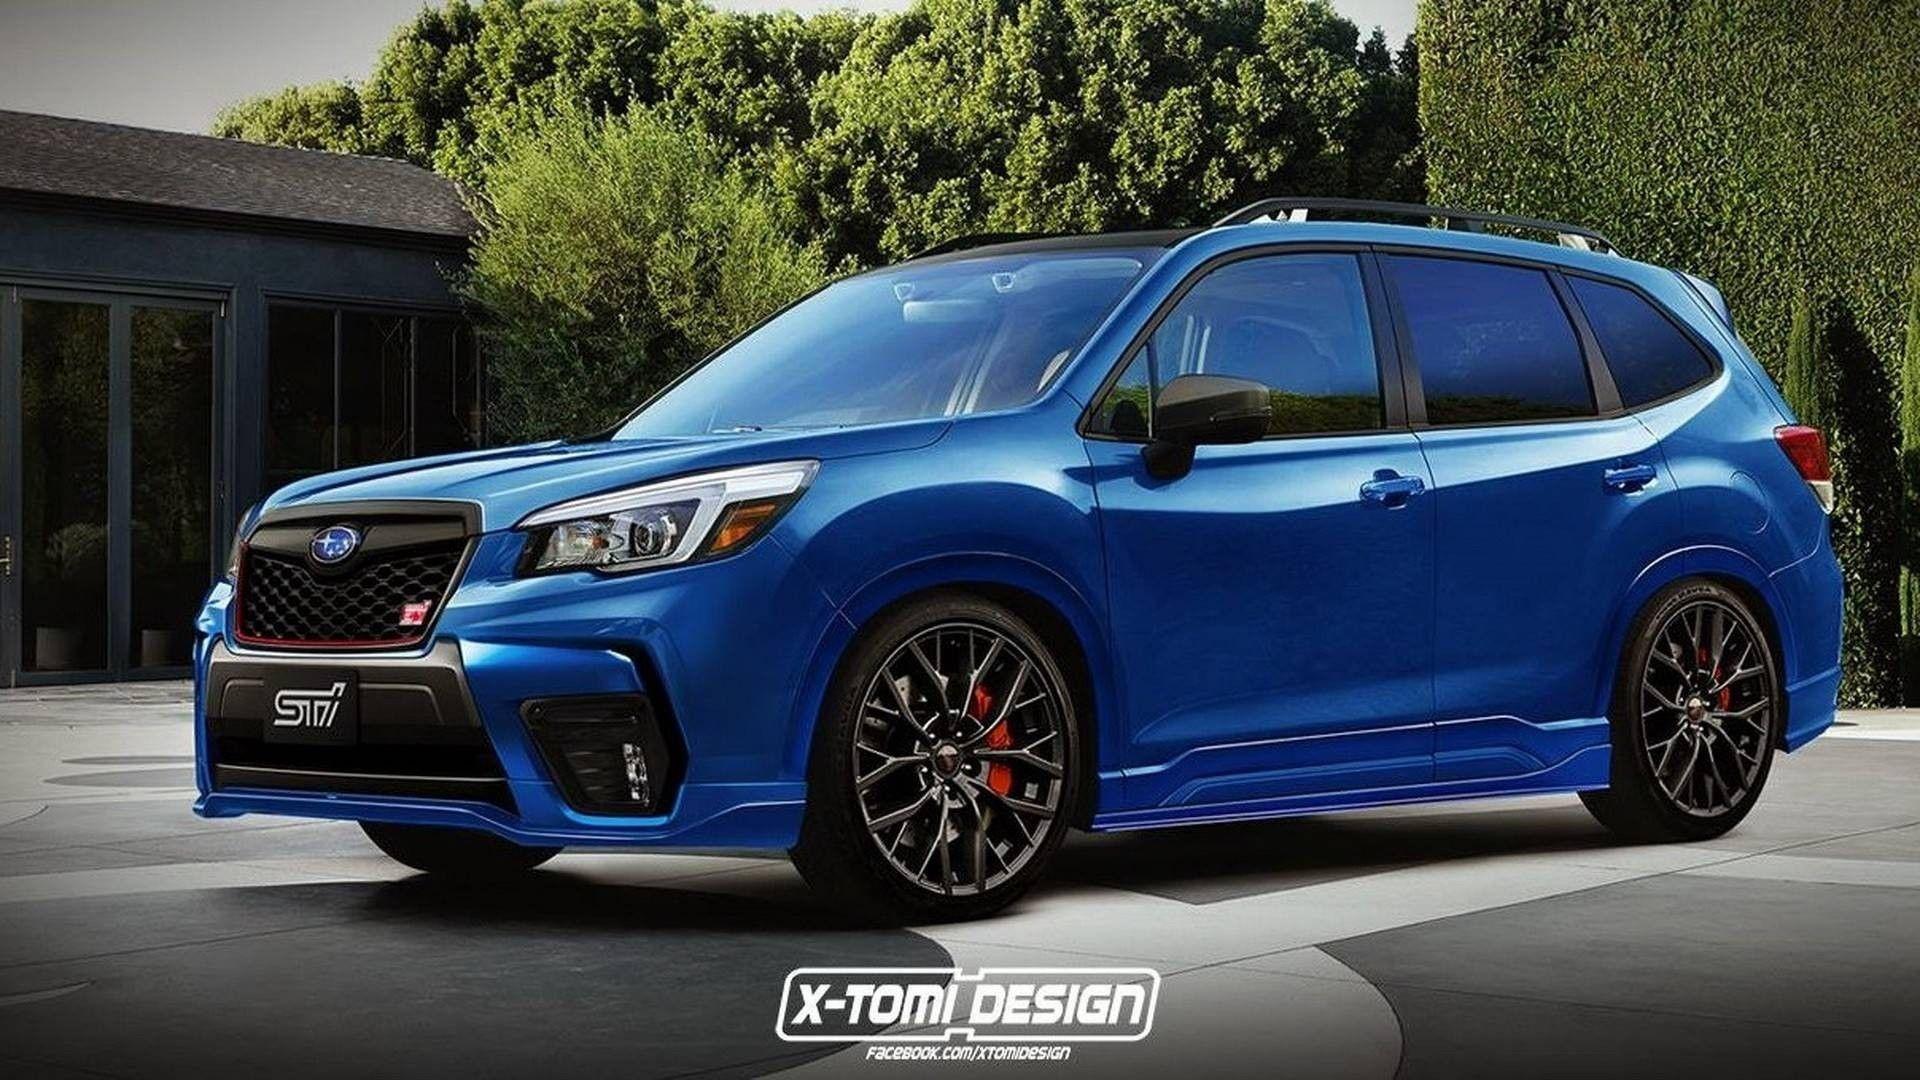 Wrx Performance Parts >> 2019 Subaru Performance Parts Spy Shoot All Car Reviews Subaru